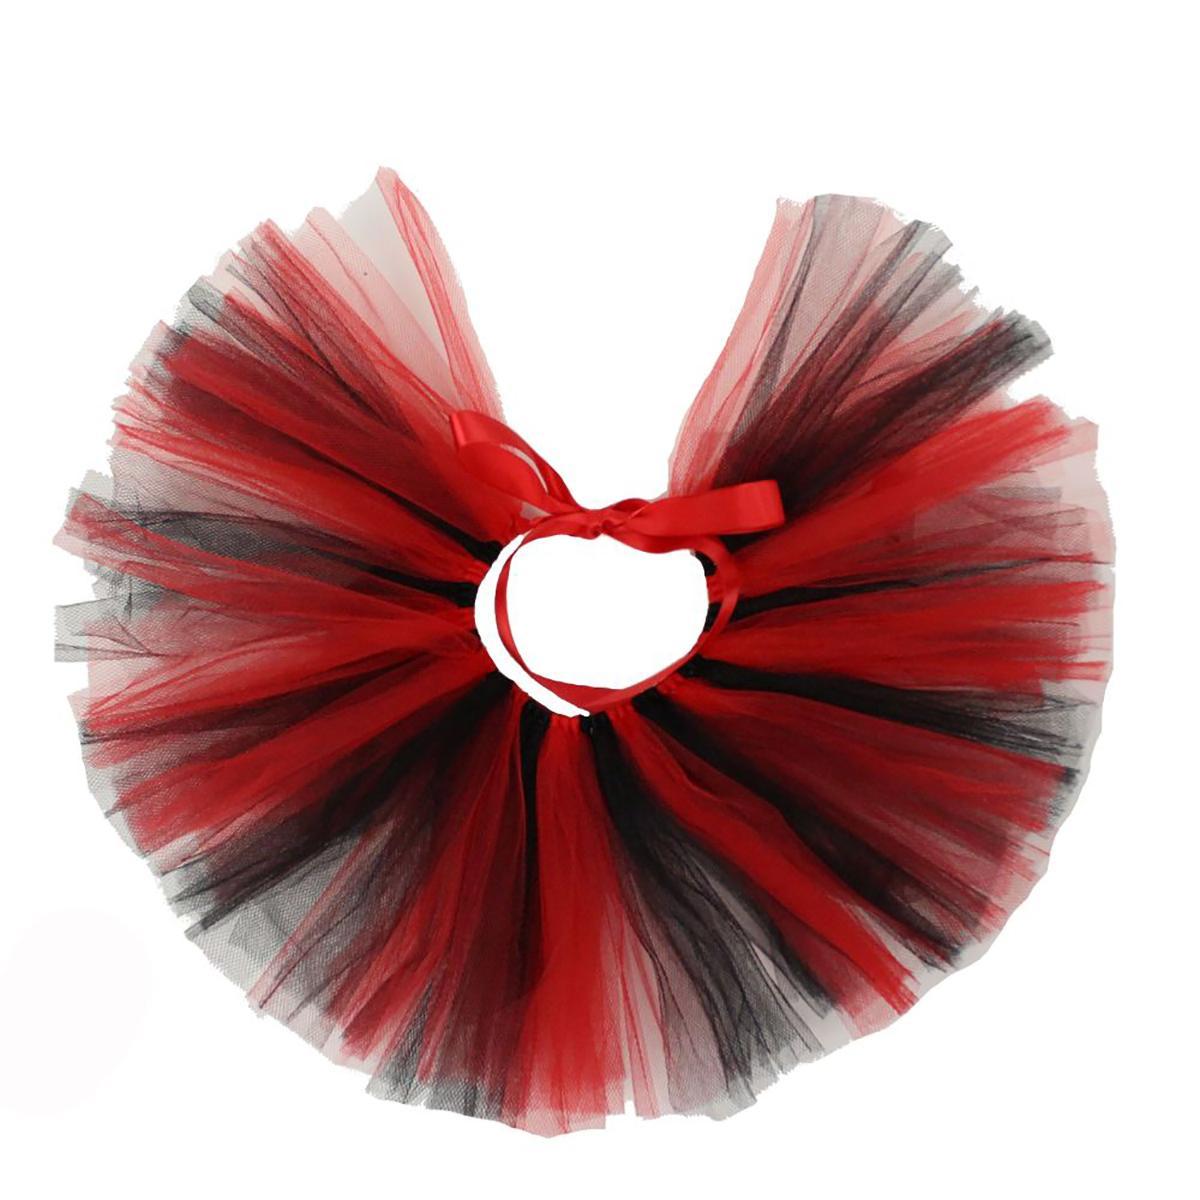 Black/Red Tulle Dog Tutu by Pawpatu